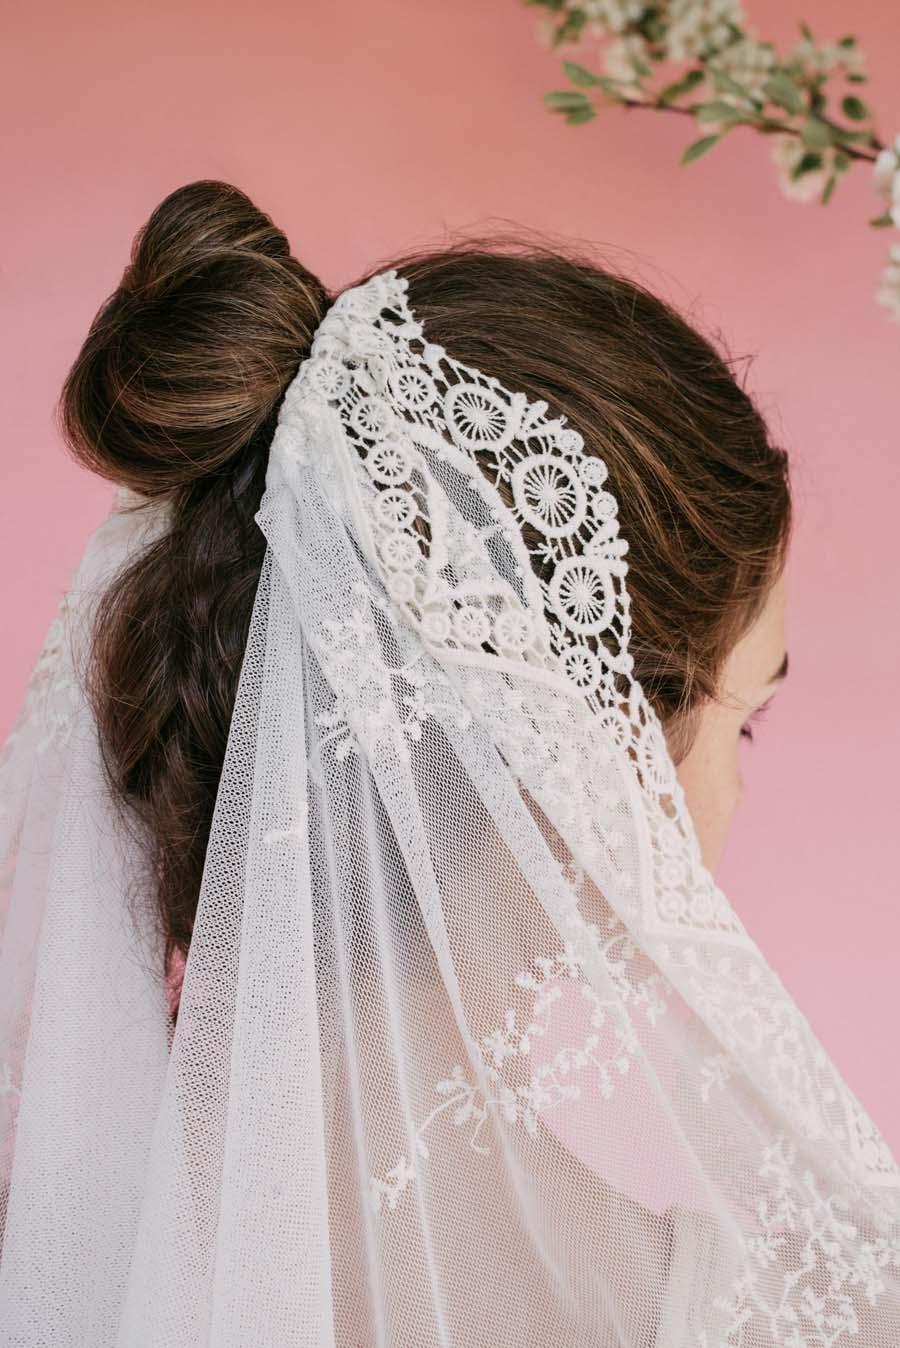 Pretty, Fun & Totally Unique Wedding Veils by Biba's Closet #veilmeagainPretty, Fun & Totally Unique Wedding Veils by Biba's Closet #veilmeagain